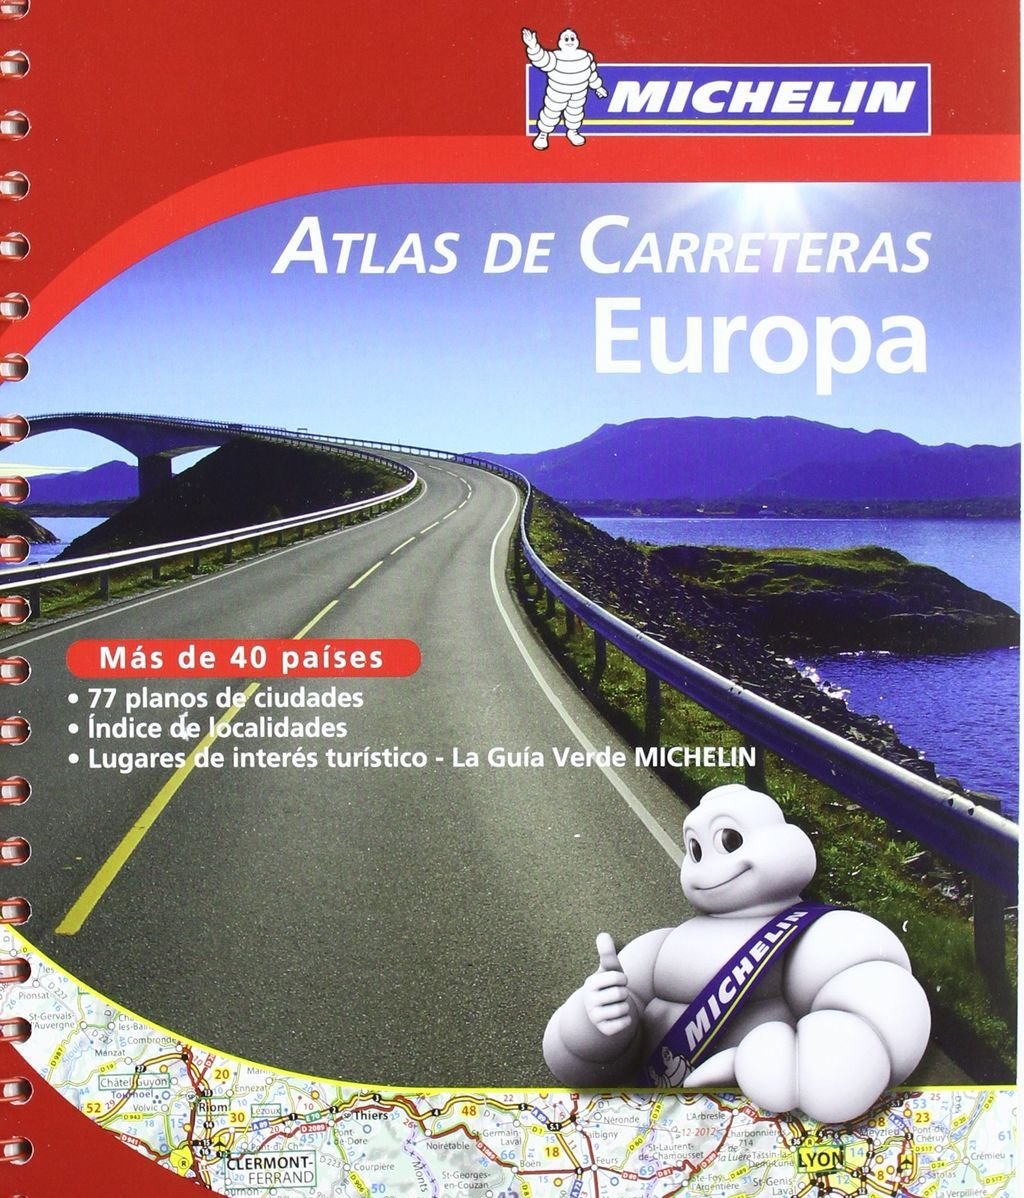 Atlas de carreteras